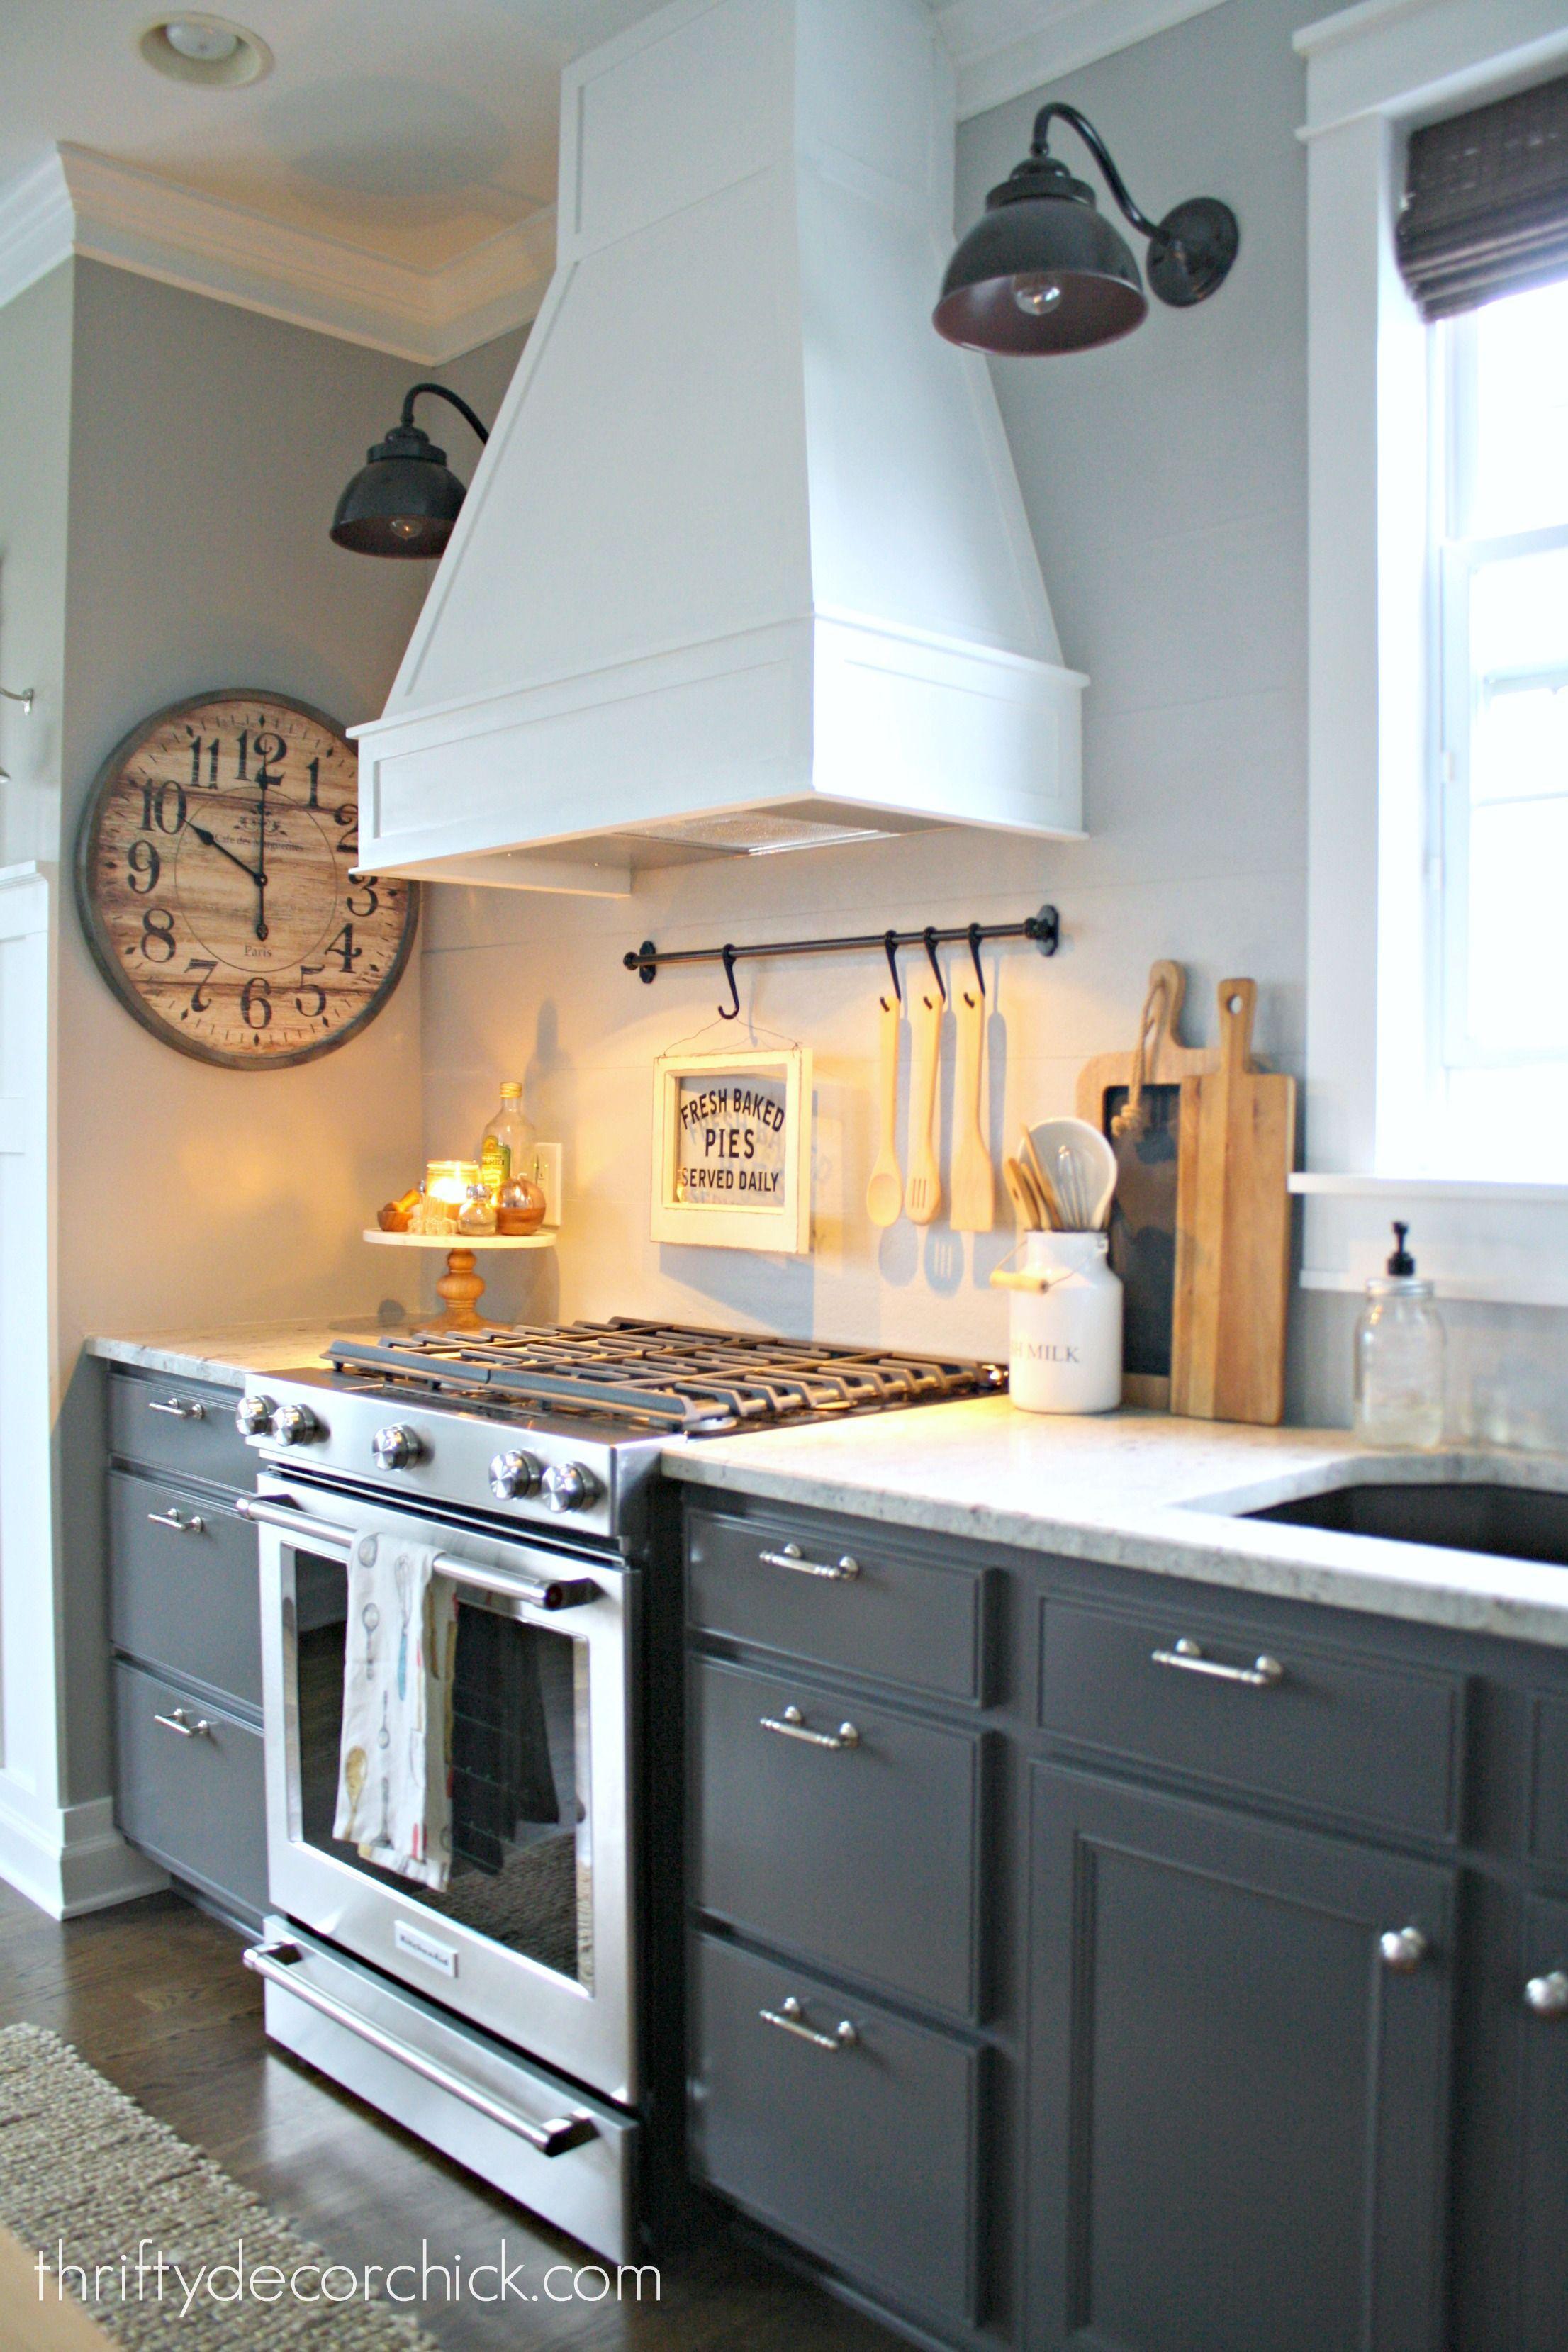 Image Result For White Wood Vent Hood Stove Decor Kitchen